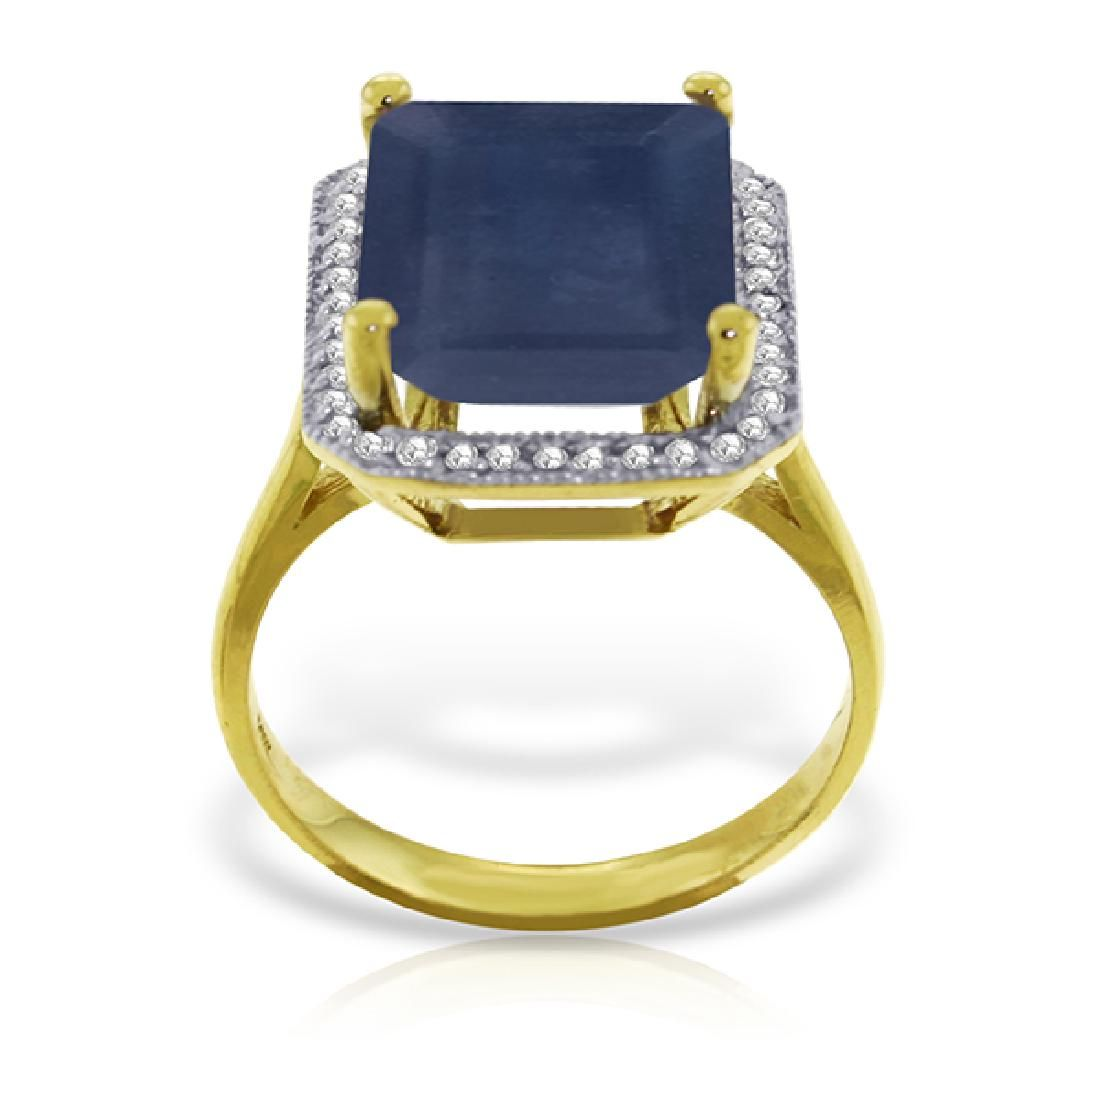 Genuine 6.6 ctw Sapphire & Diamond Ring Jewelry 14KT